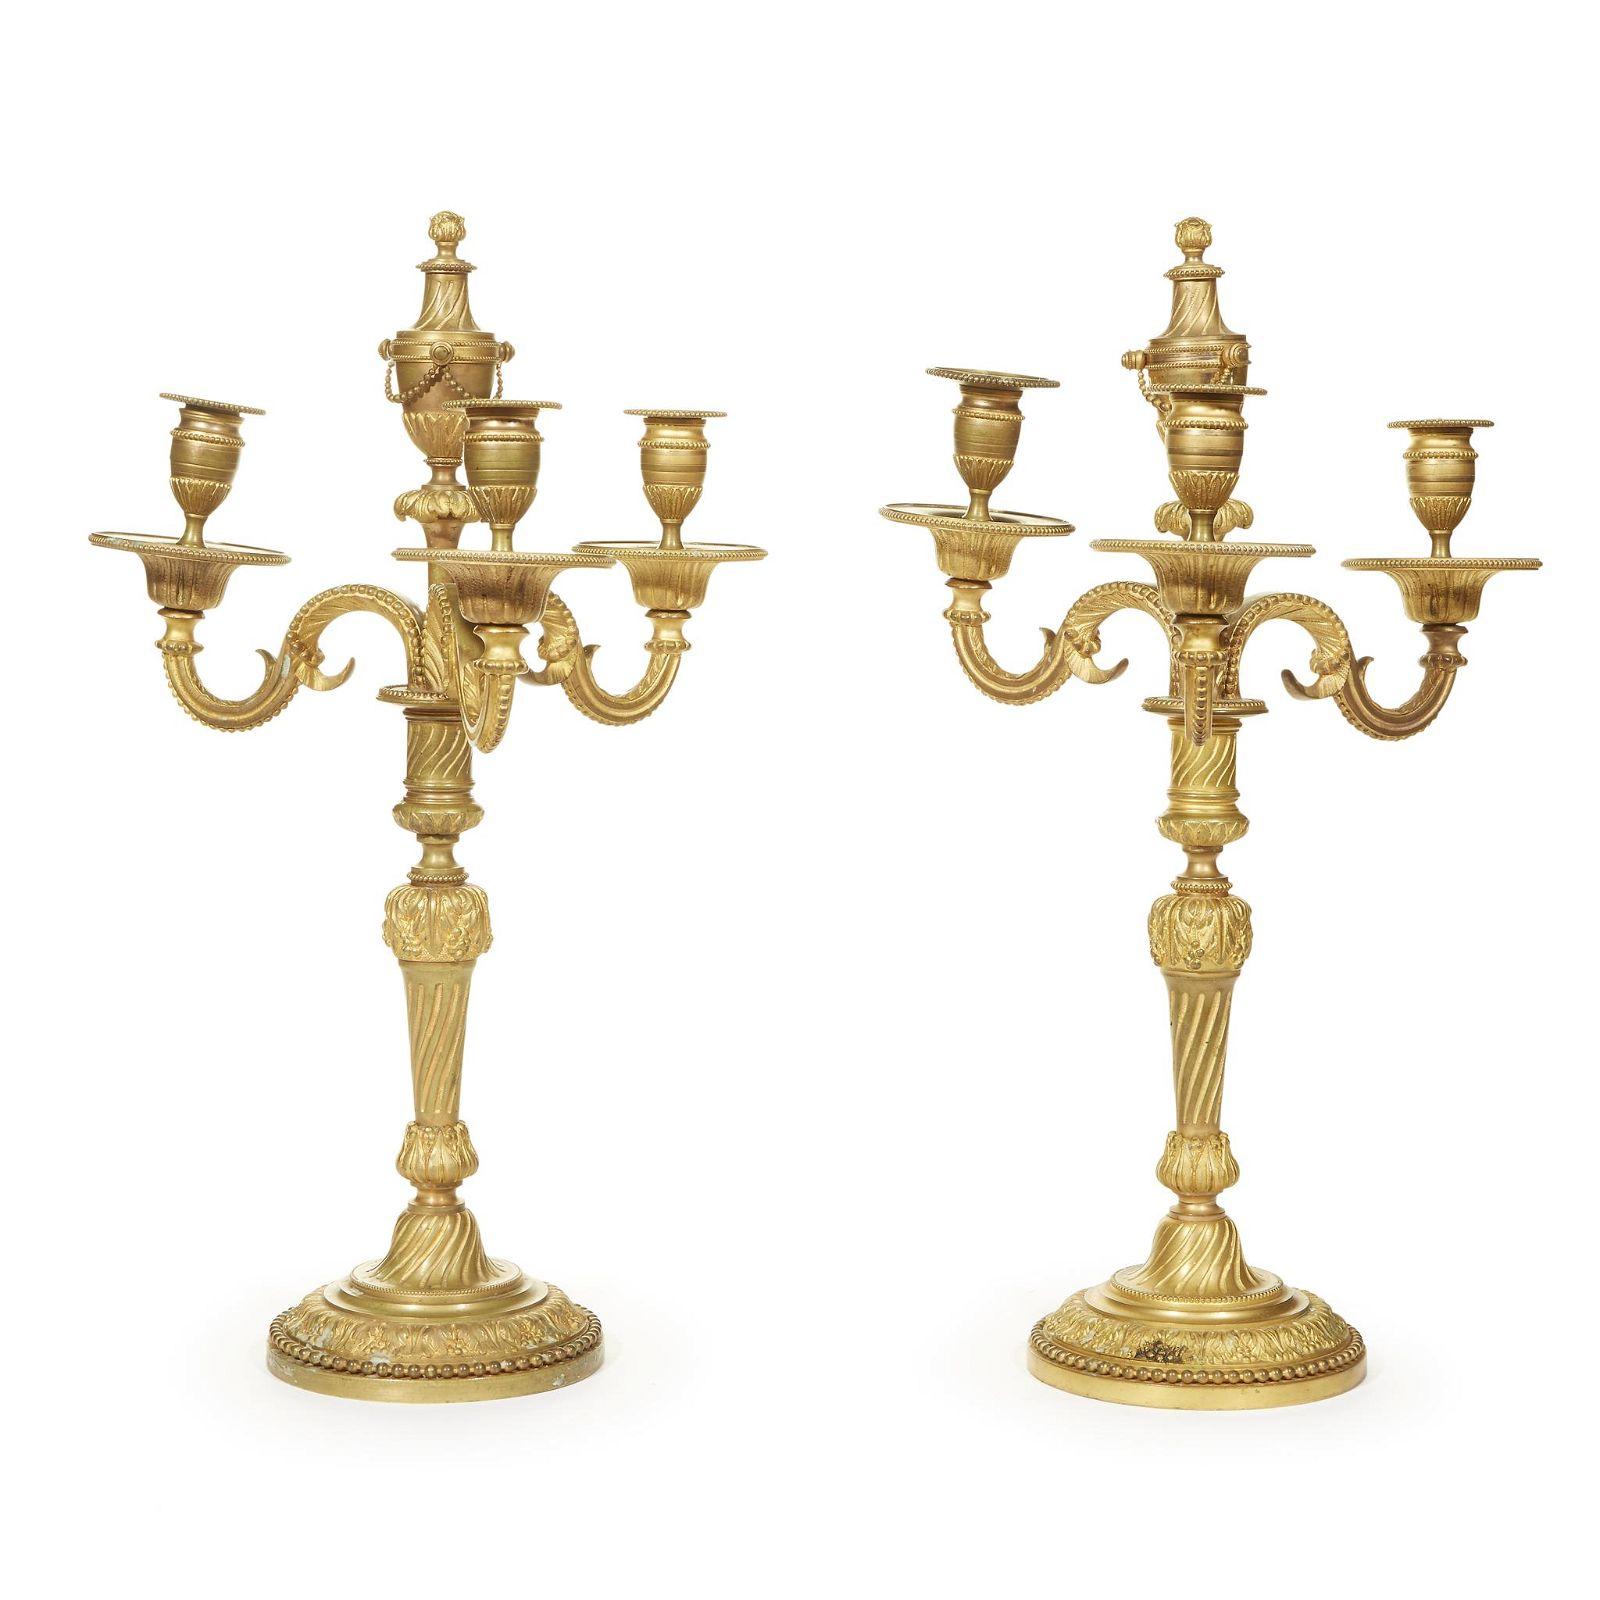 A pair of Louis XVI style gilt-bronze three-light